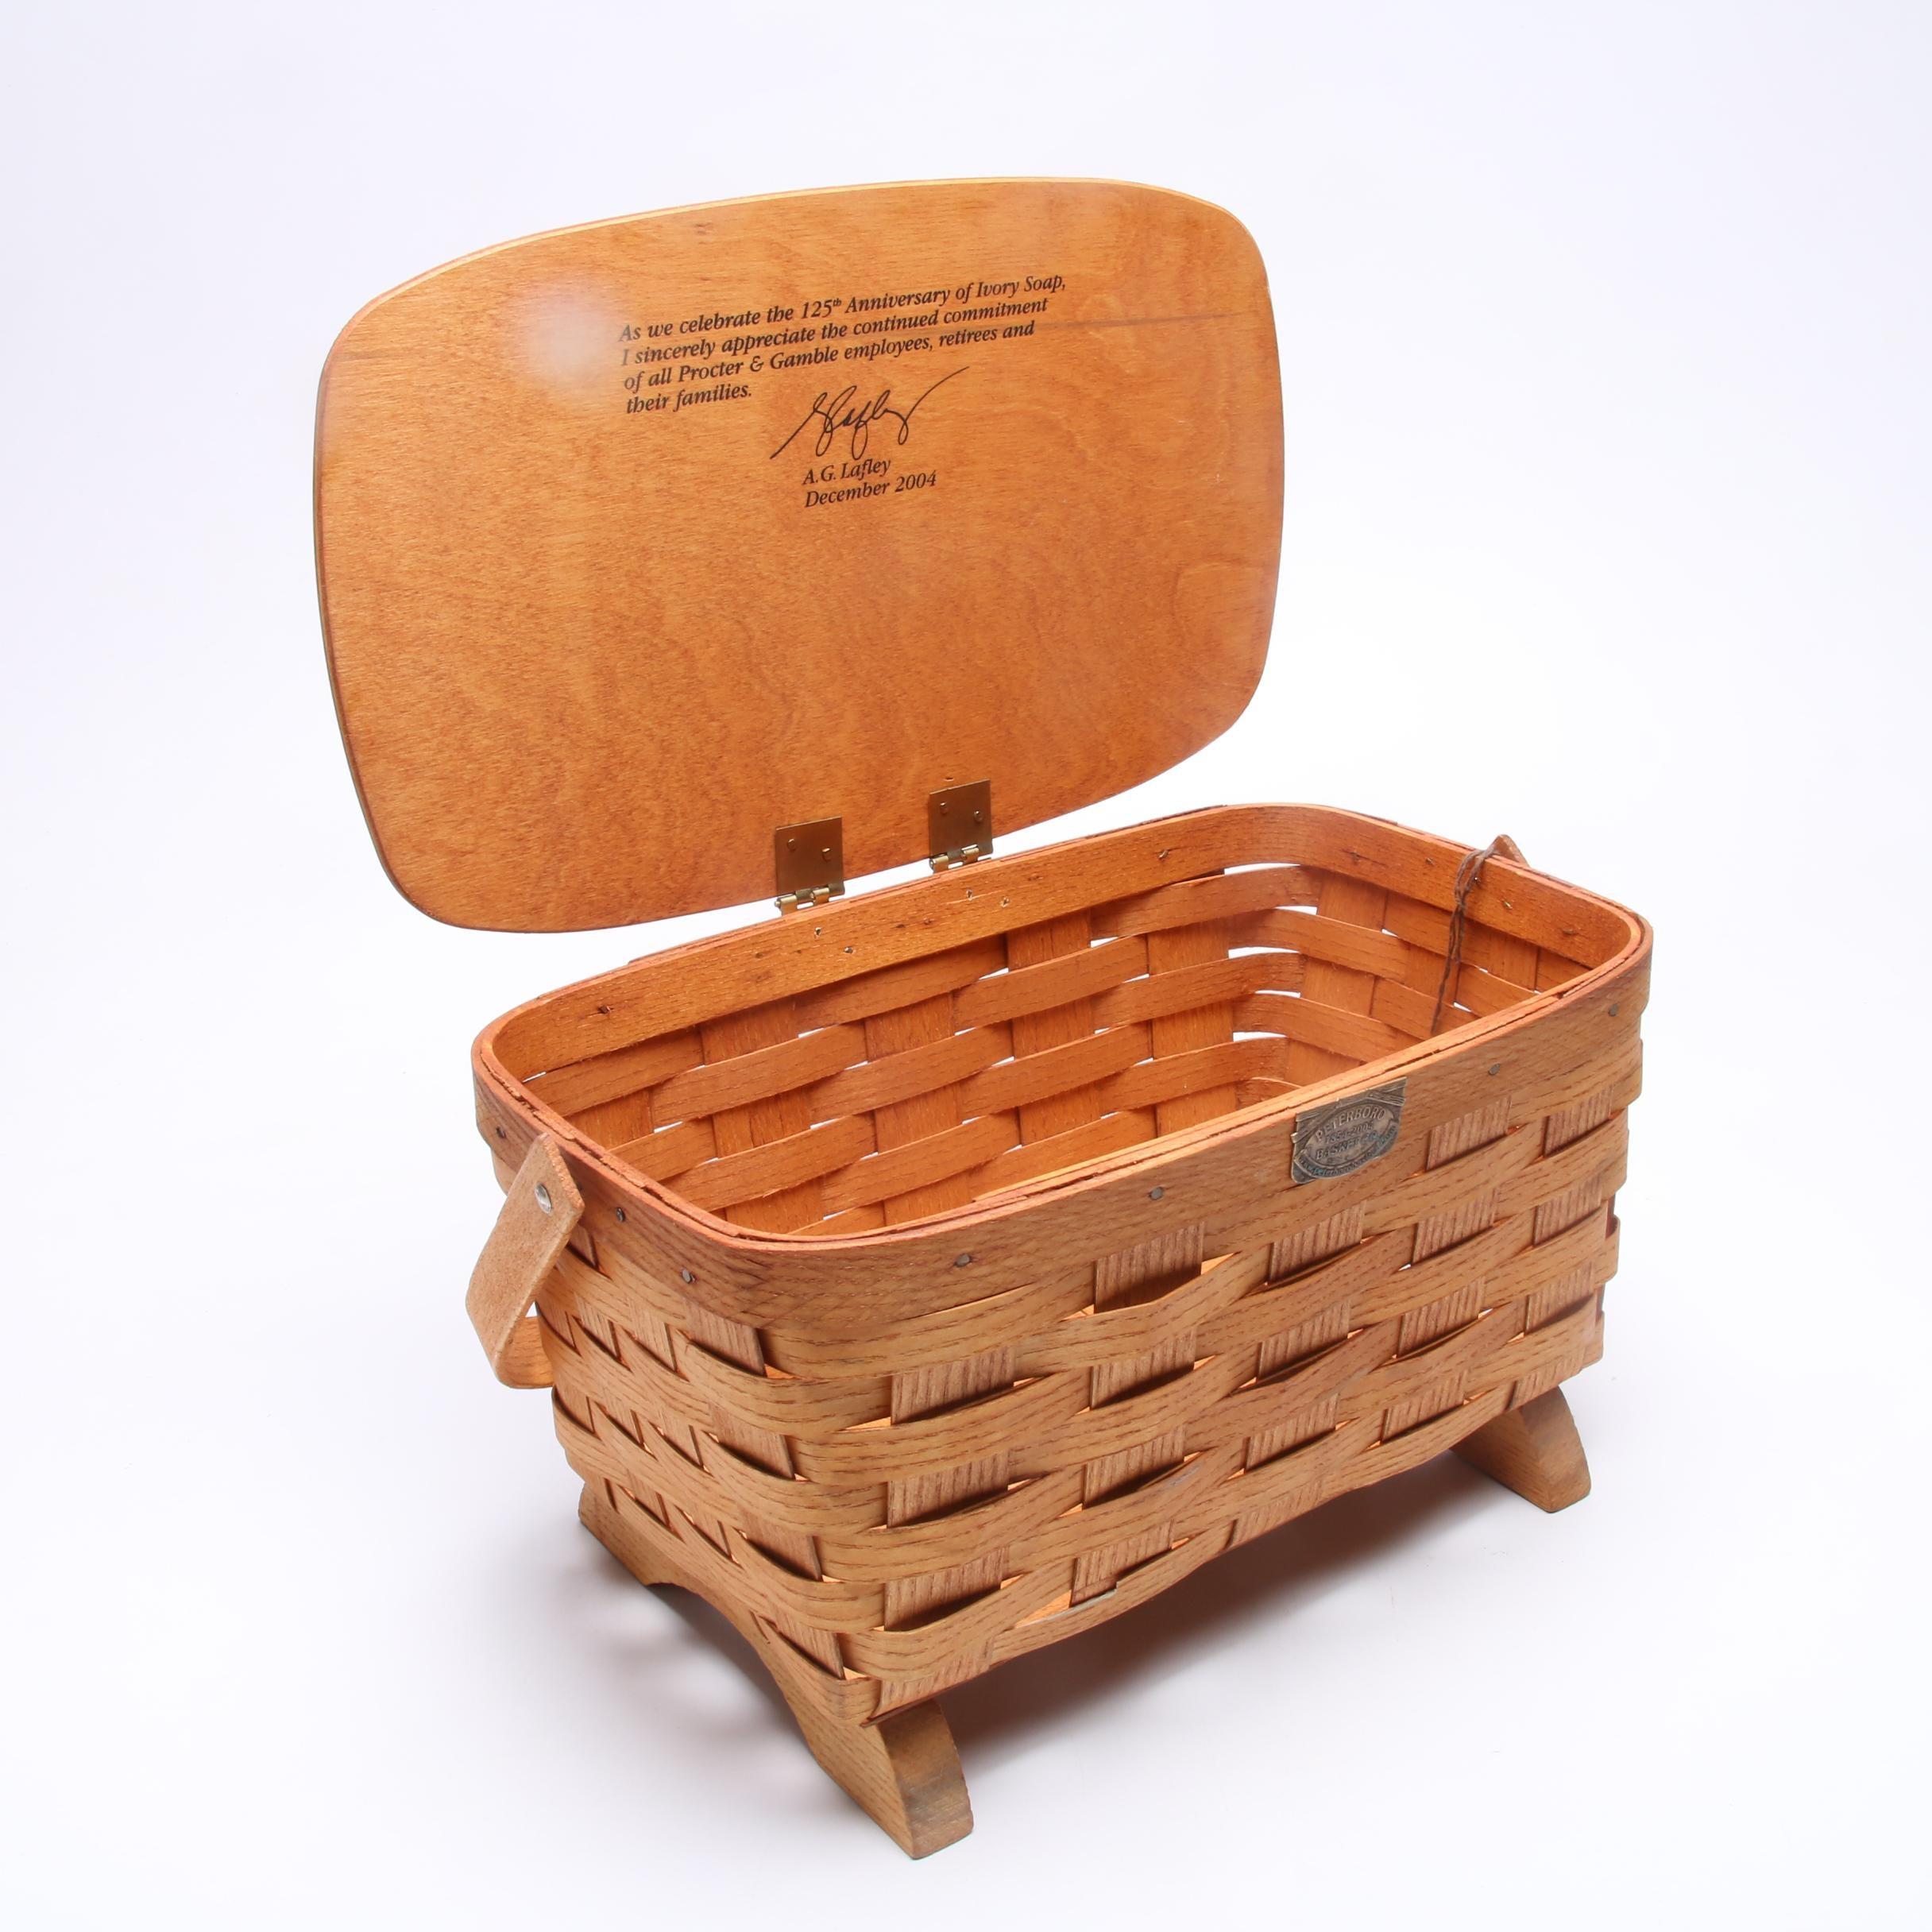 2004 Commemorative Procter & Gamble Ivory Soap Basket